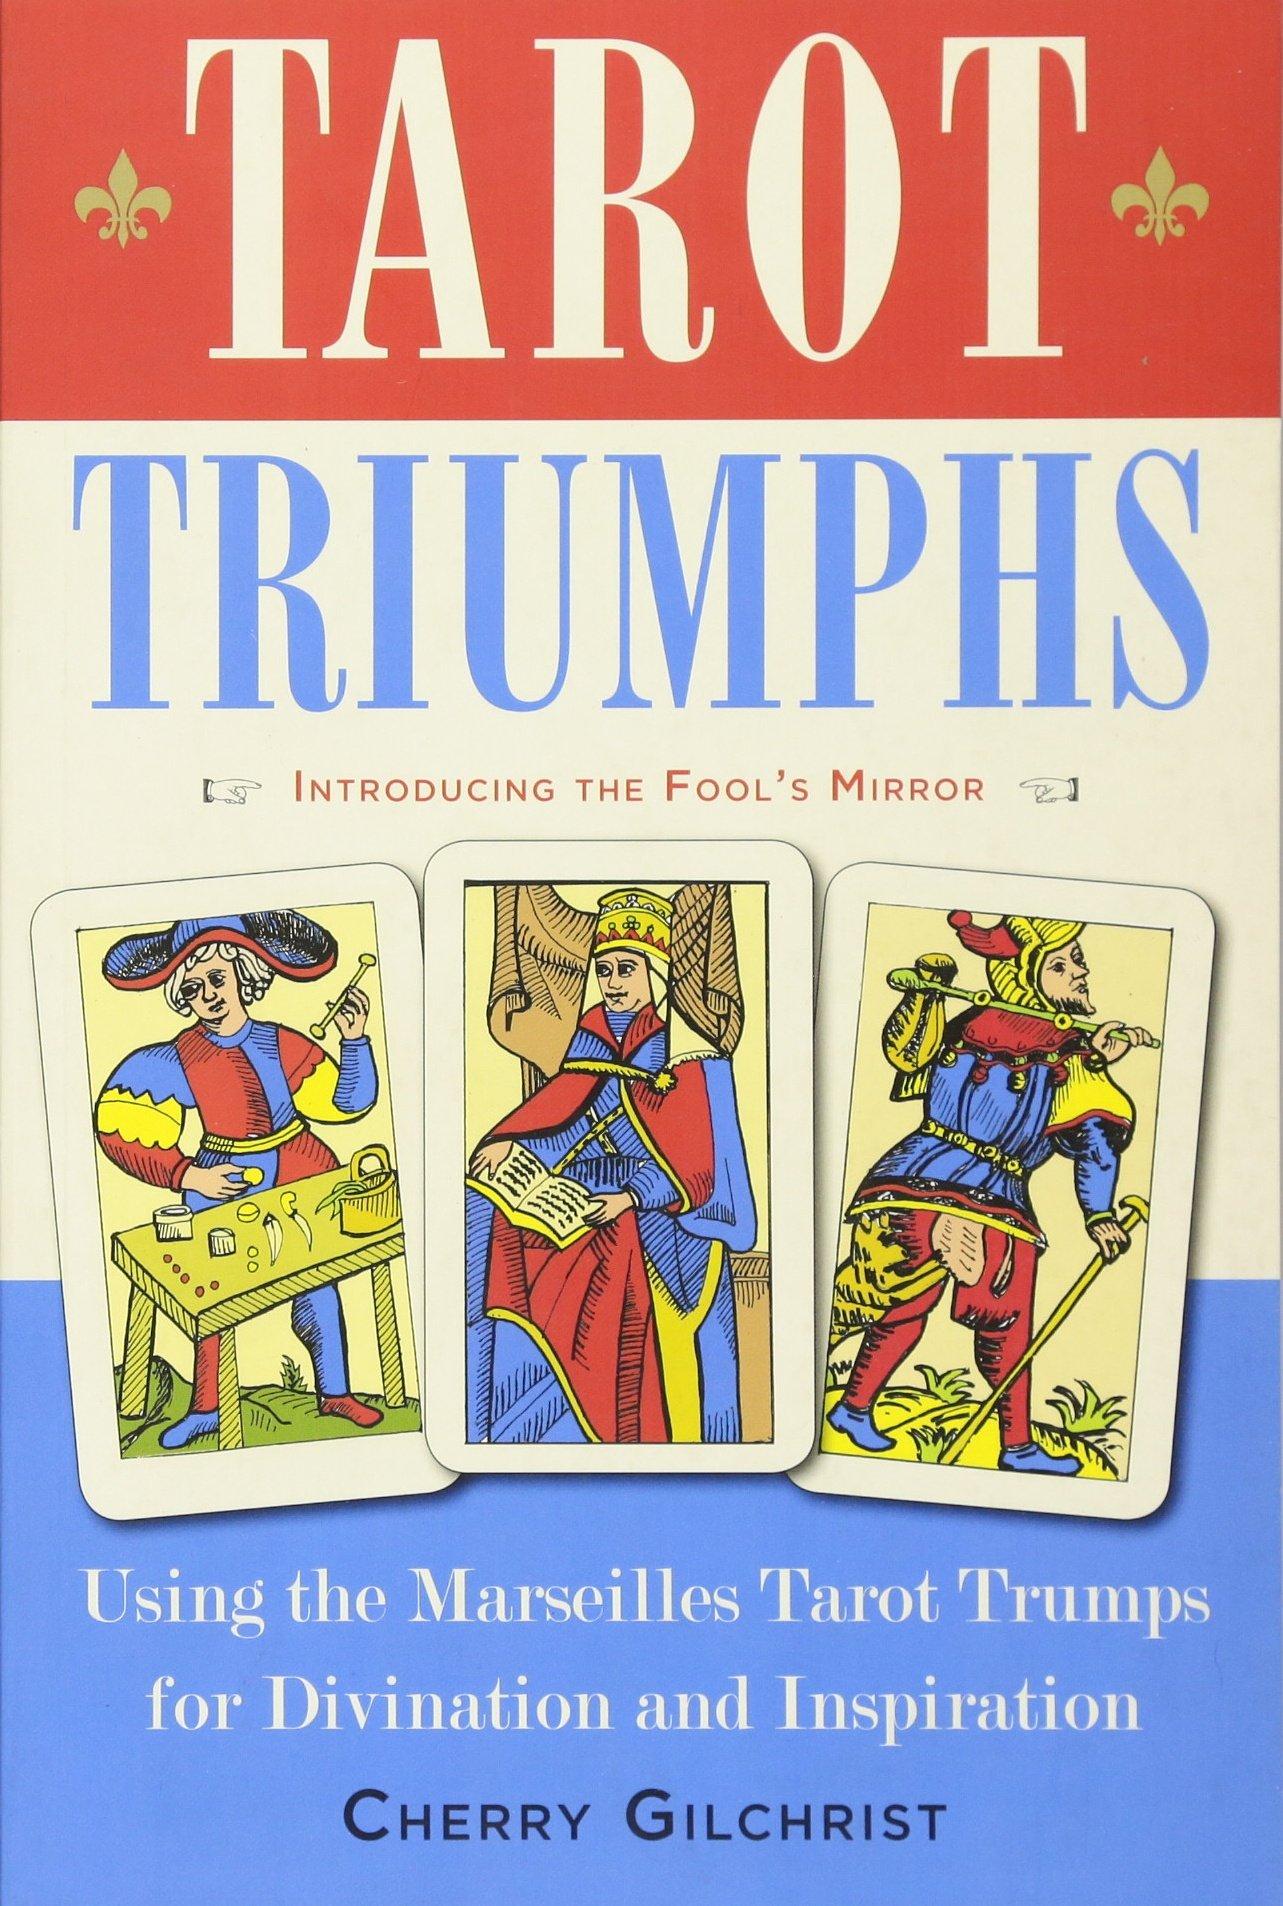 Tarot triumphs using the marseilles tarot trumps for divination and tarot triumphs using the marseilles tarot trumps for divination and inspiration cherry gilchrist 9781578636044 amazon books fandeluxe Gallery